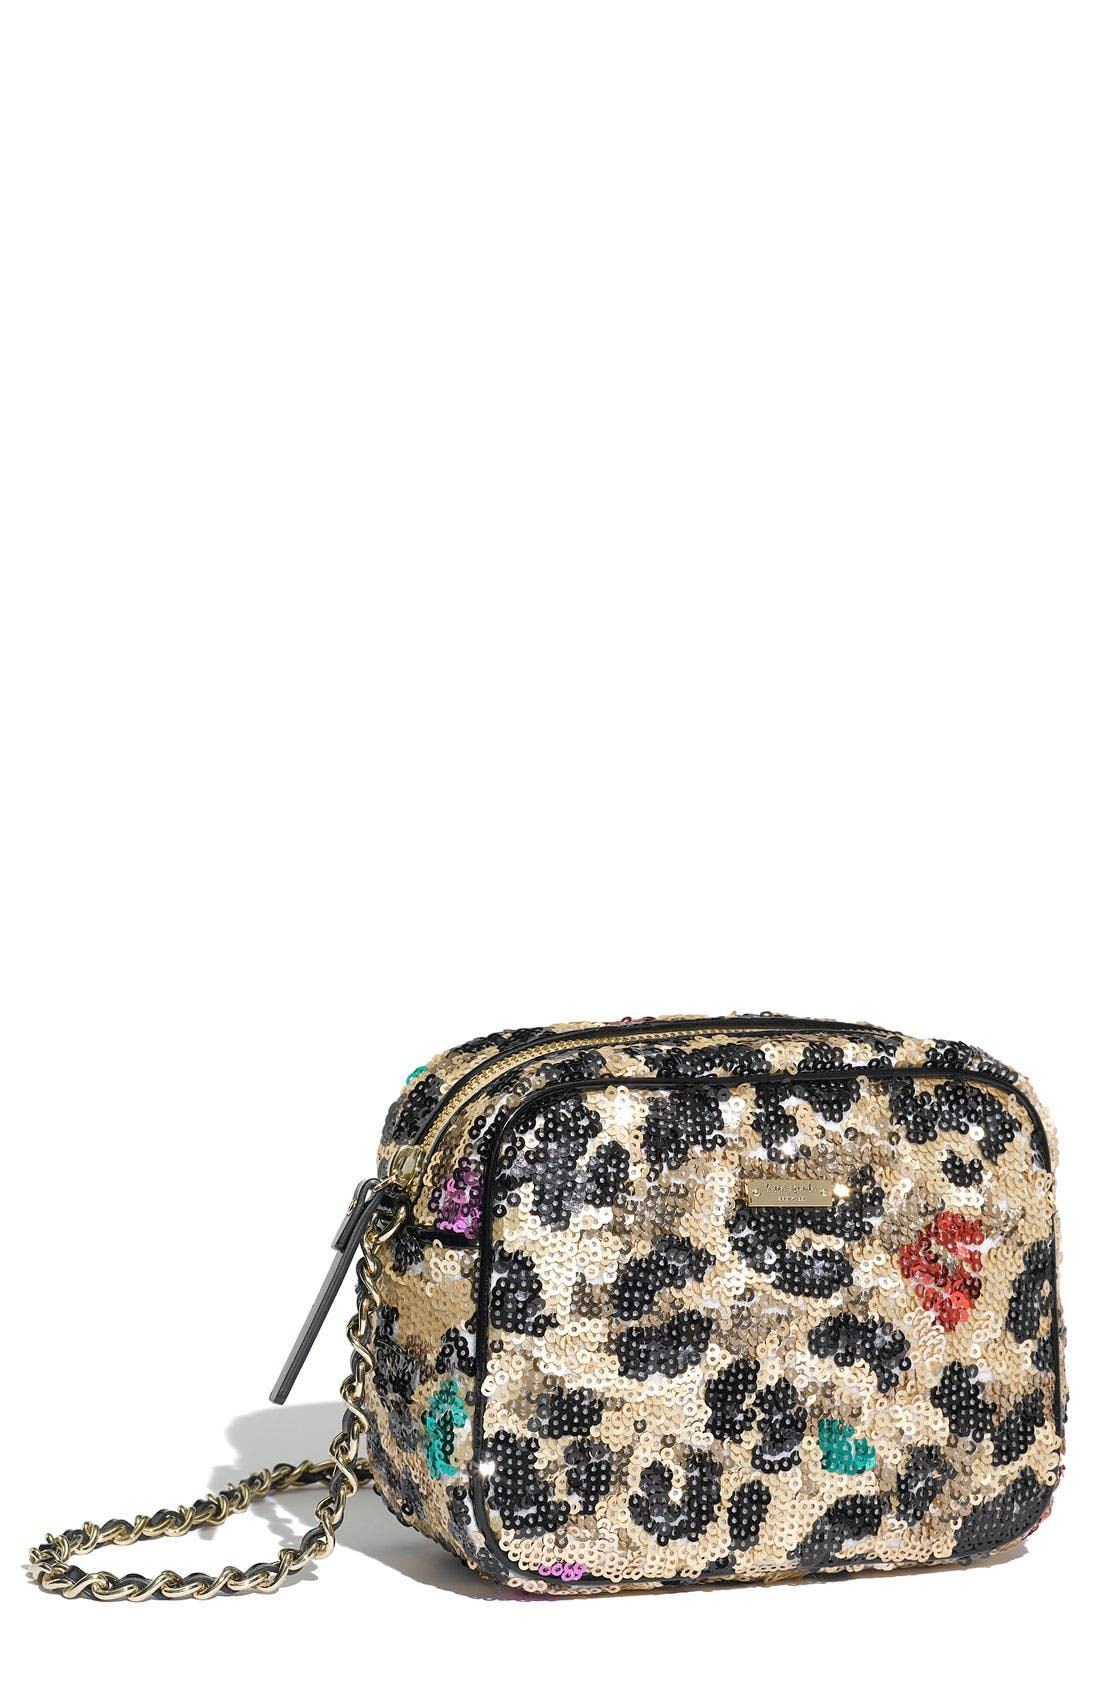 Main Image - kate spade new york 'lauralee' sequin crossbody bag